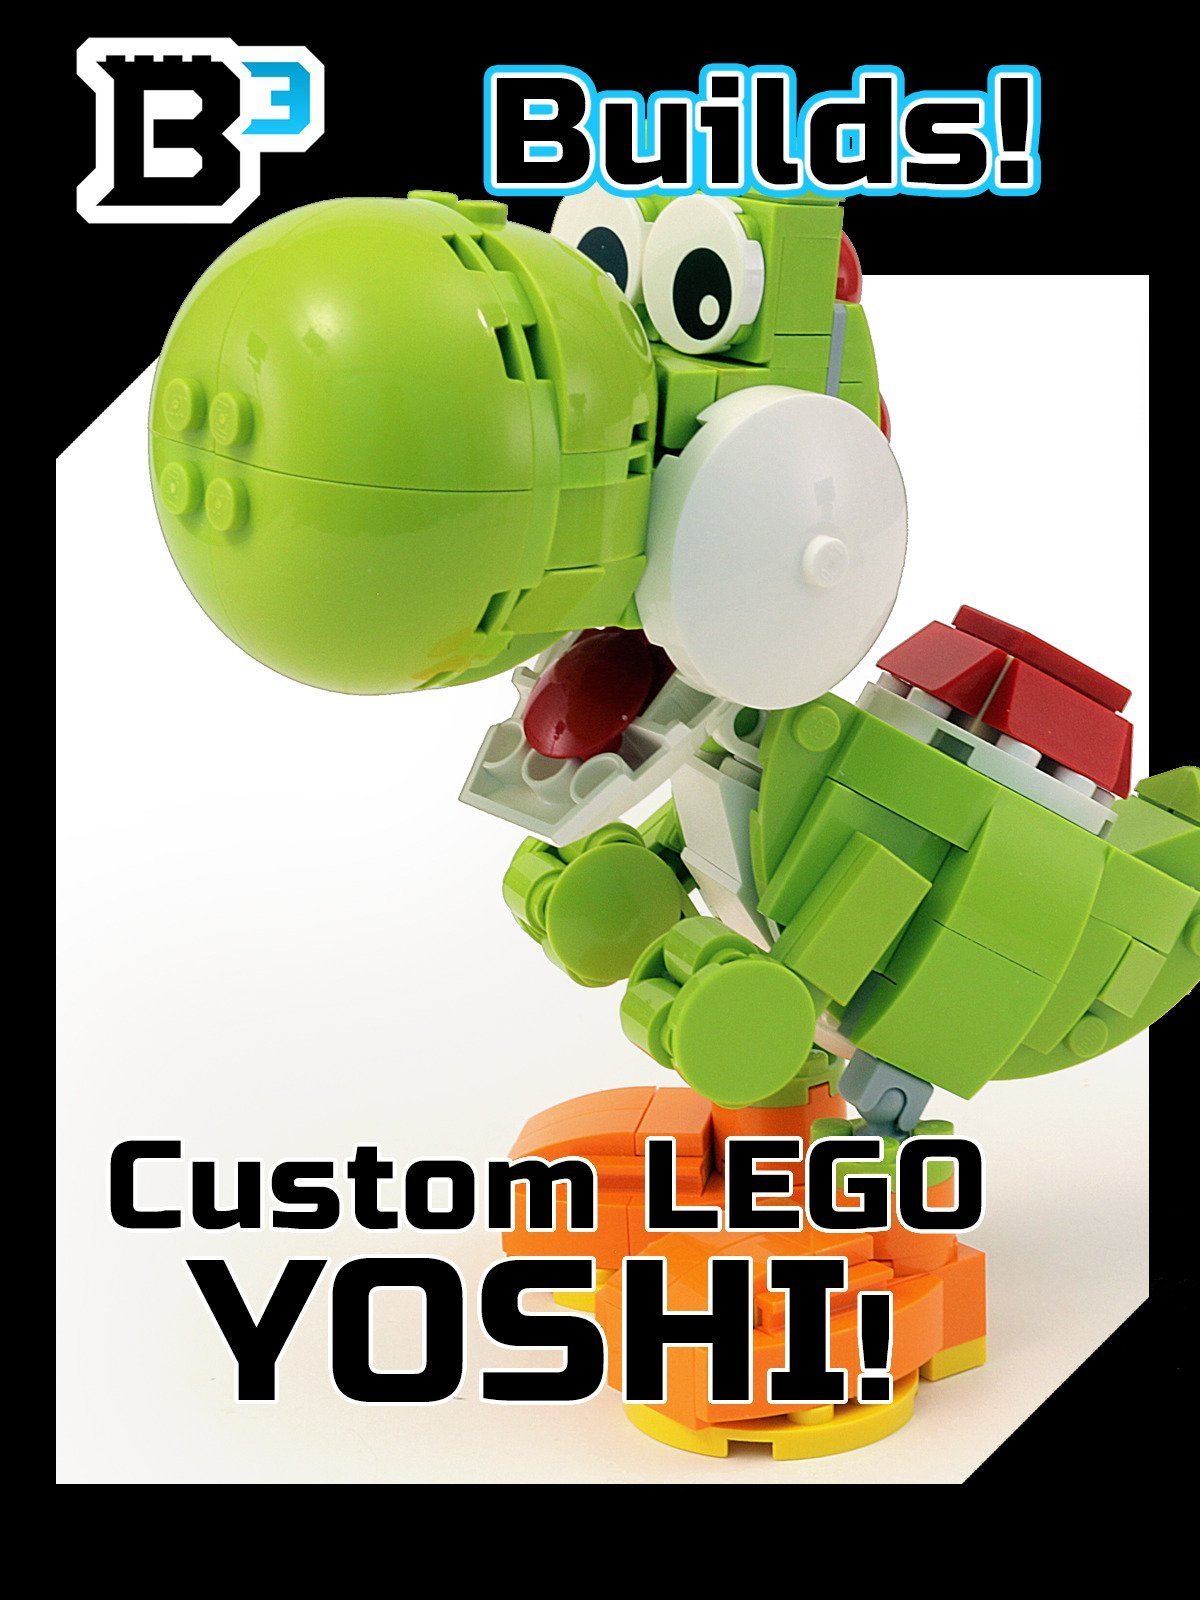 B3 Builds! Custom LEGO Yoshi Figure